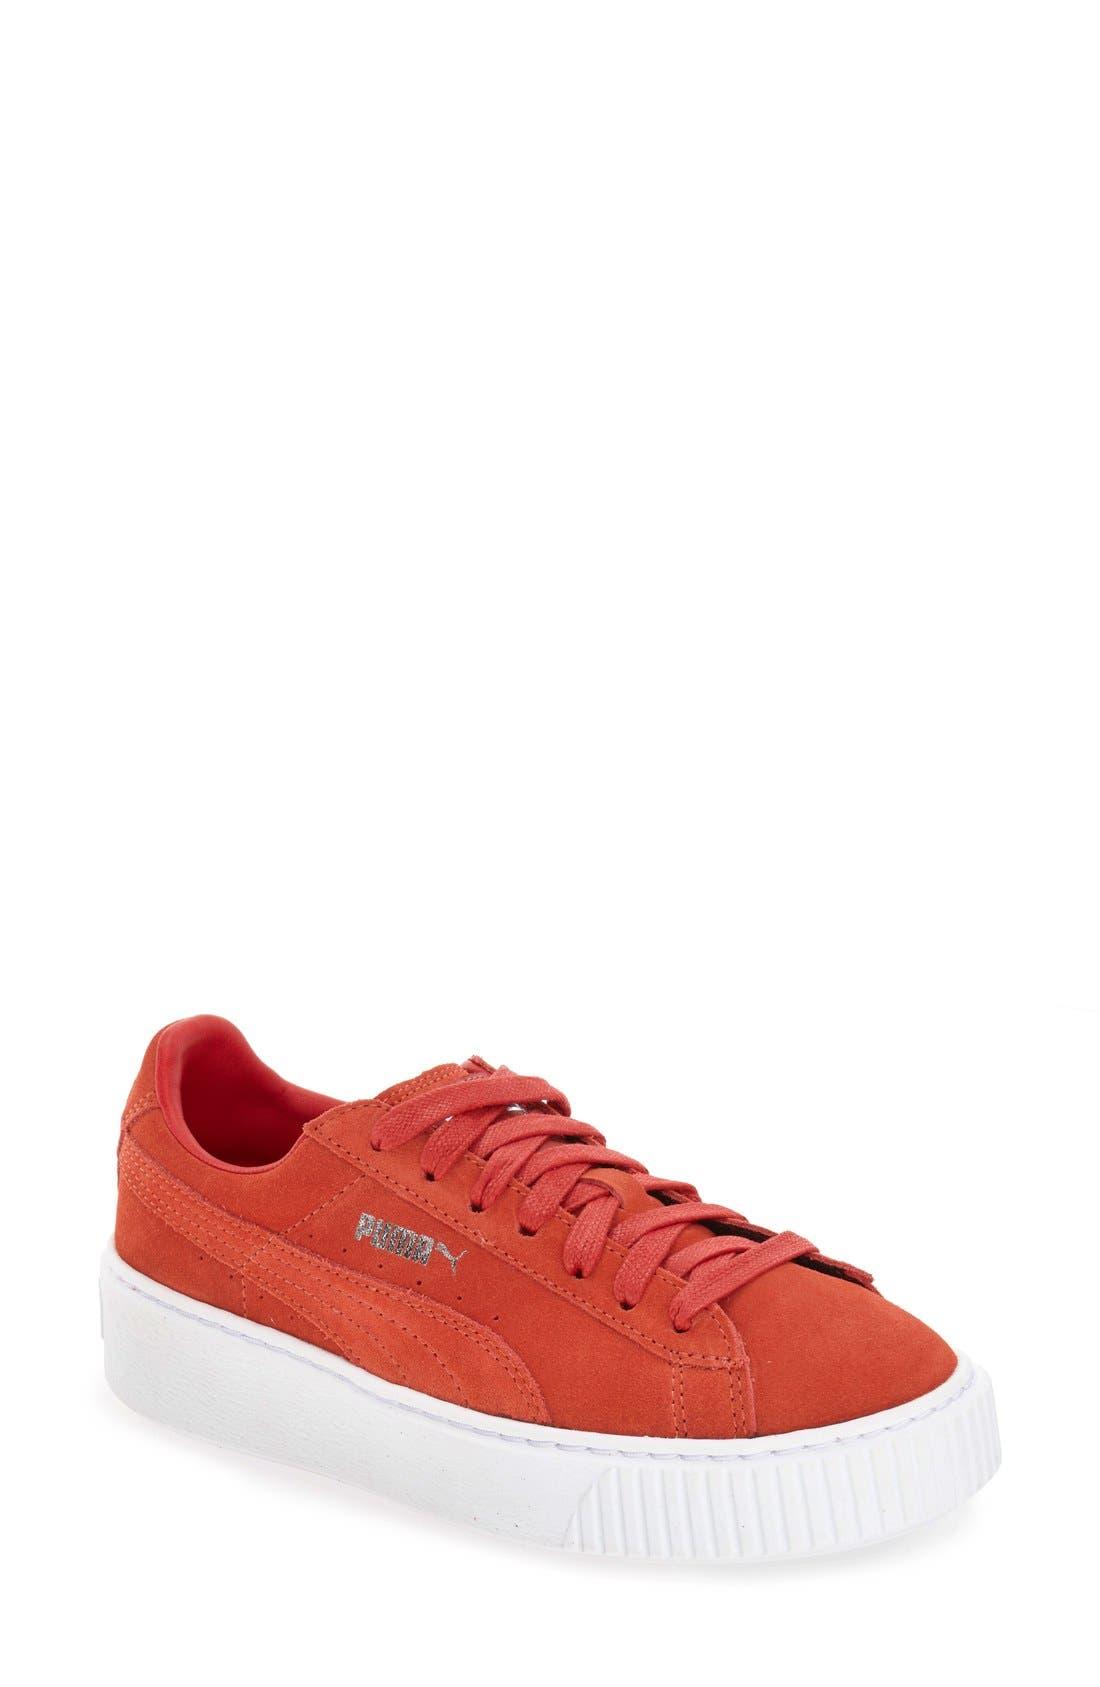 PUMA Suede Platform Sneaker (Women)